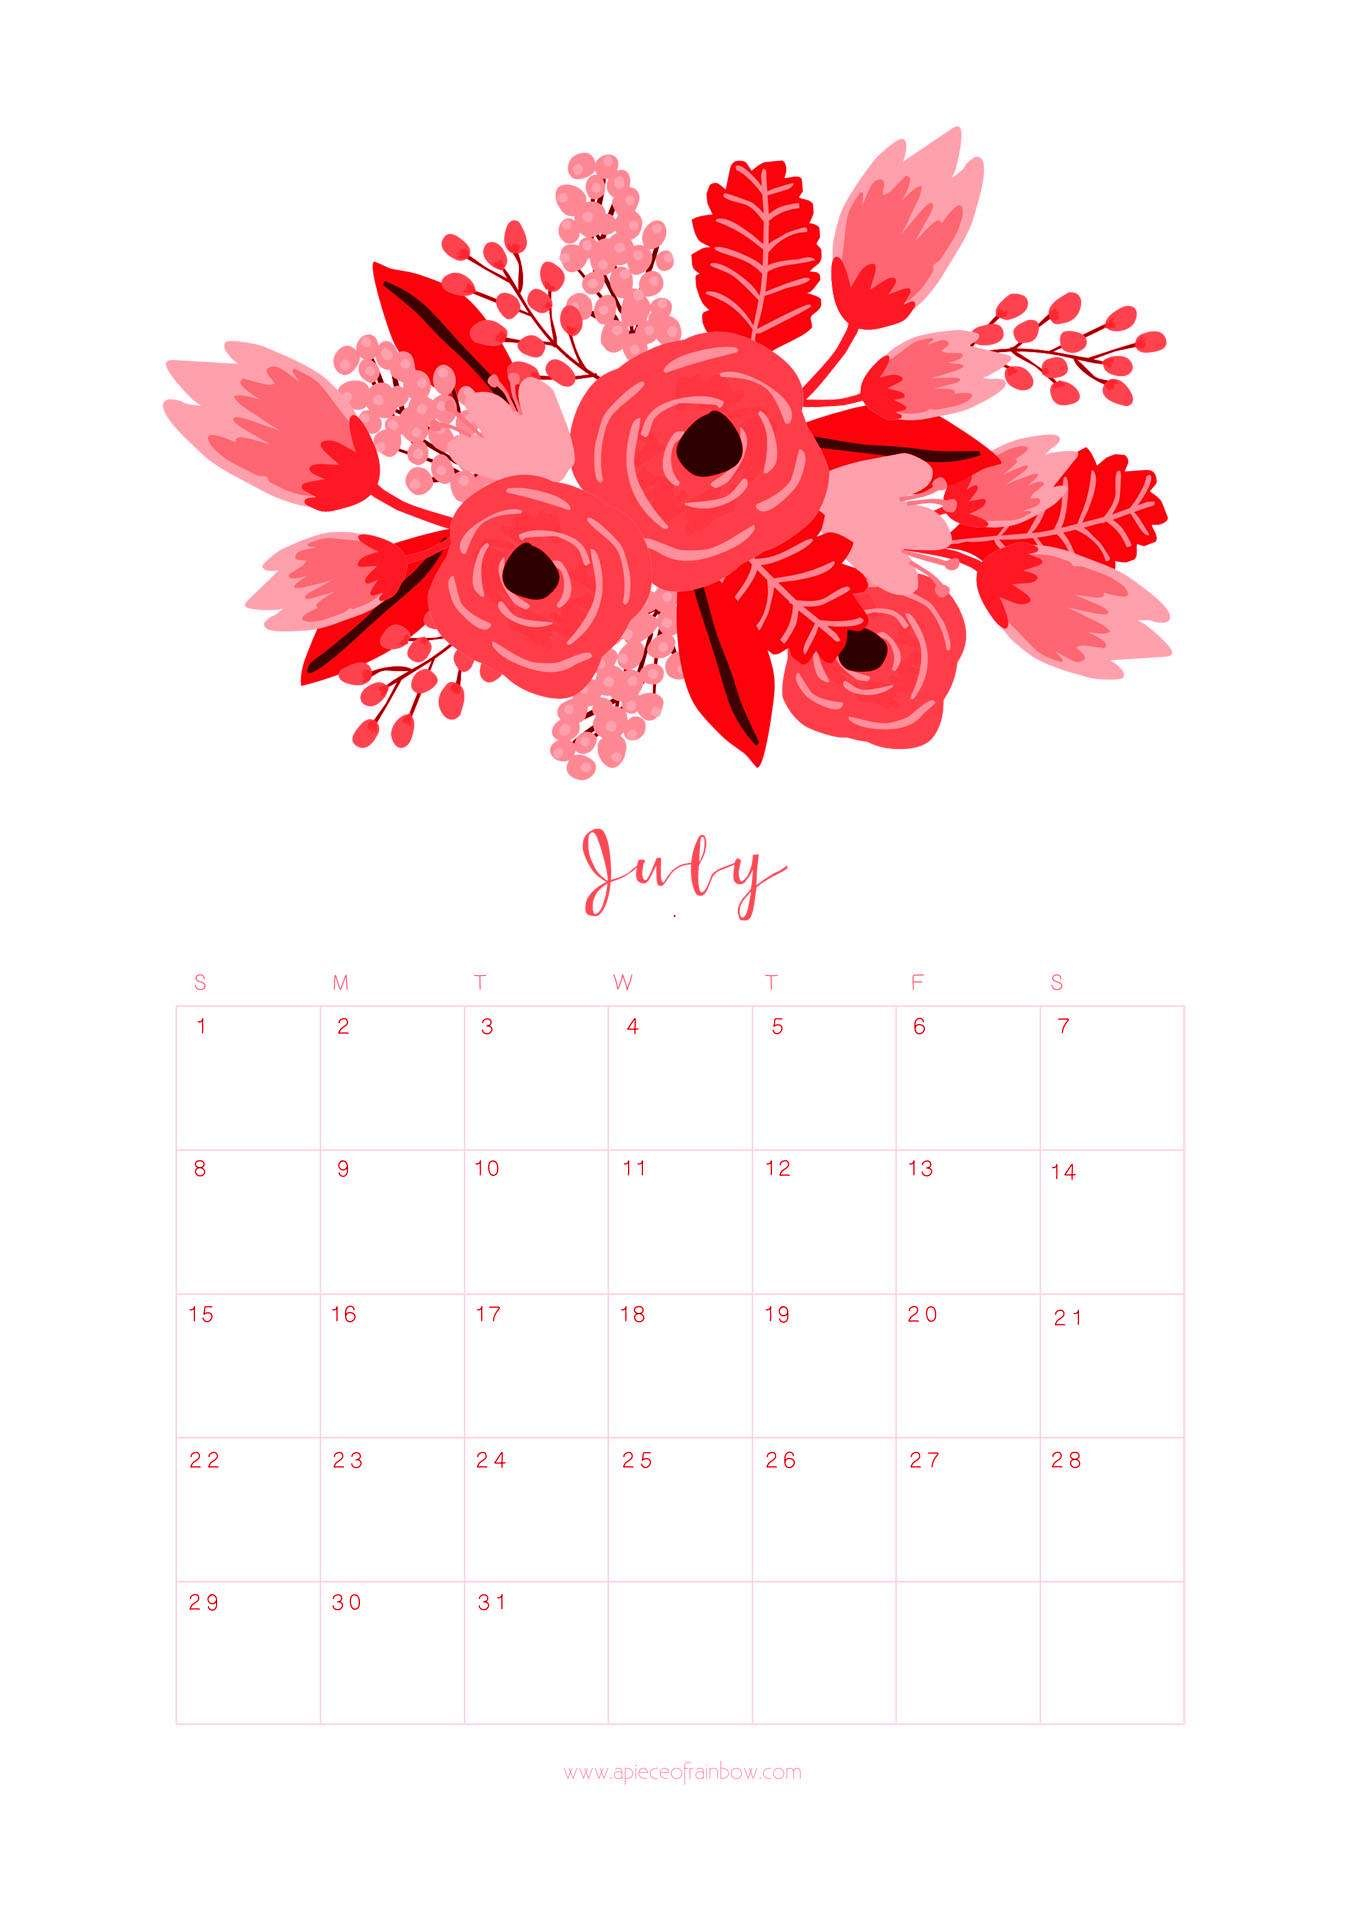 July 2018 Flower Calendar Printable   2018 Calendars   July Calendar regarding July Calendar Template Flowers